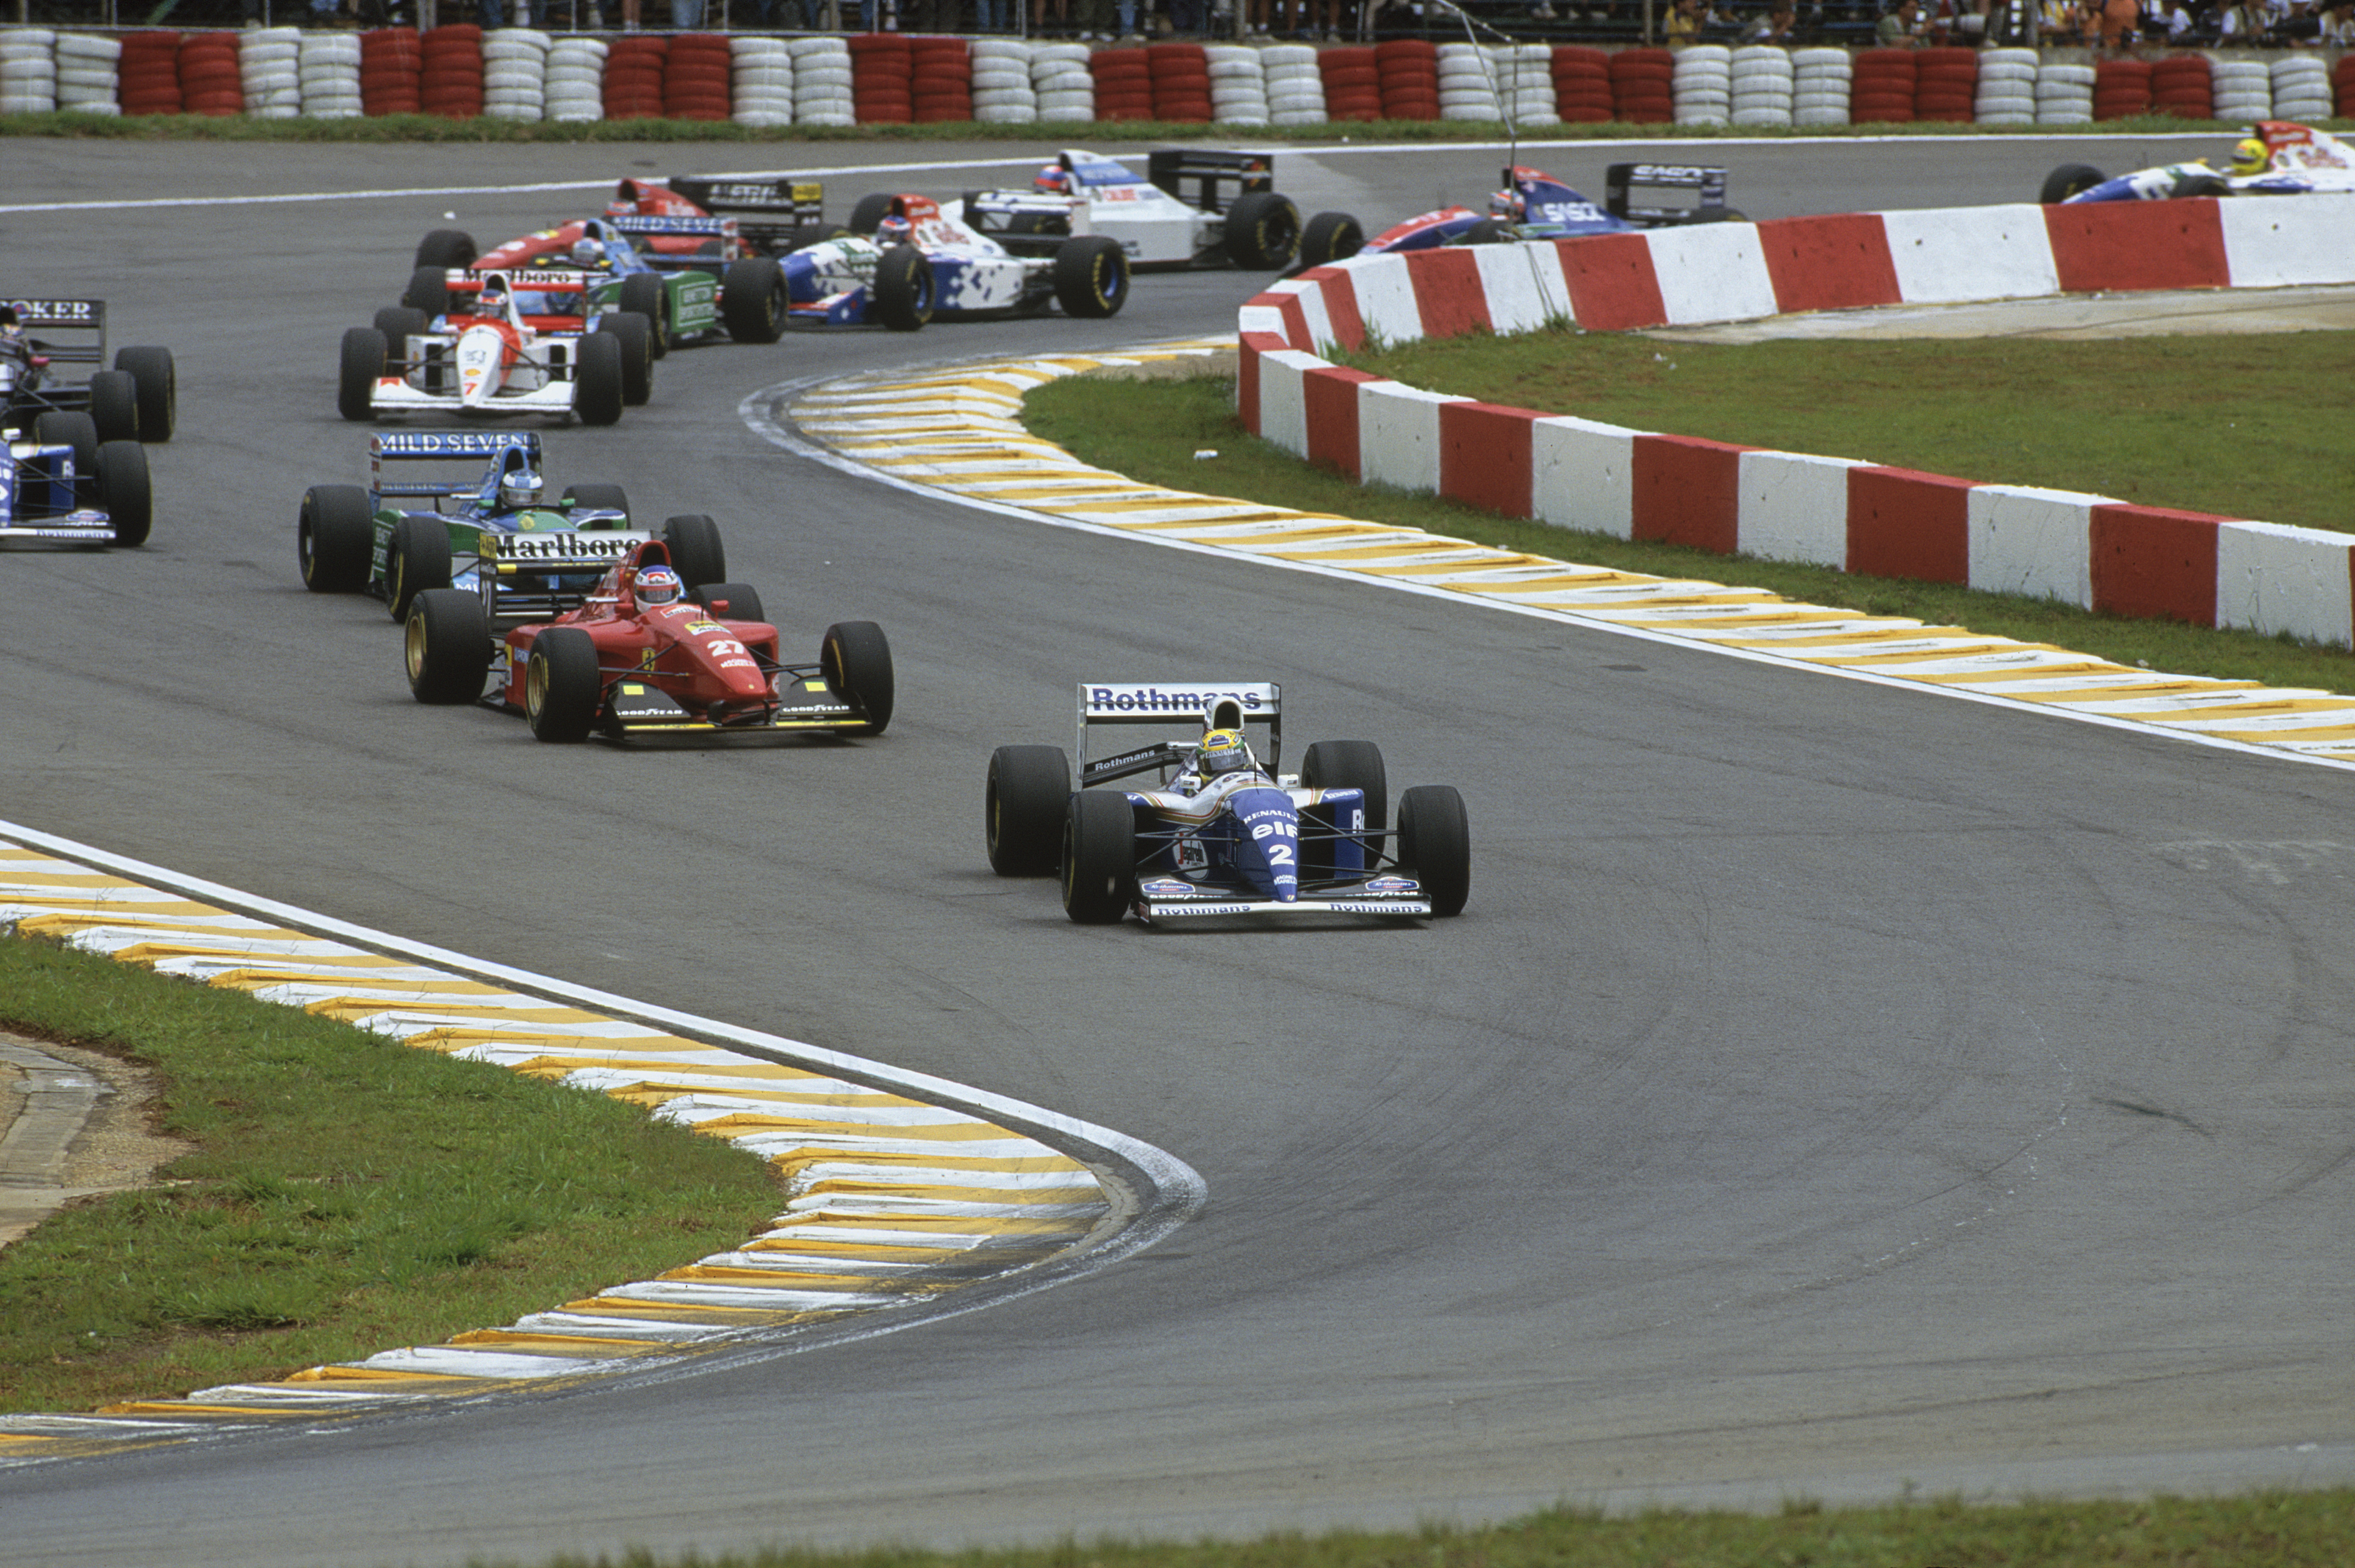 Senna leder fra Pole i Brasil GP 1994, foran Alesi og Schumacher. Foto: Williams